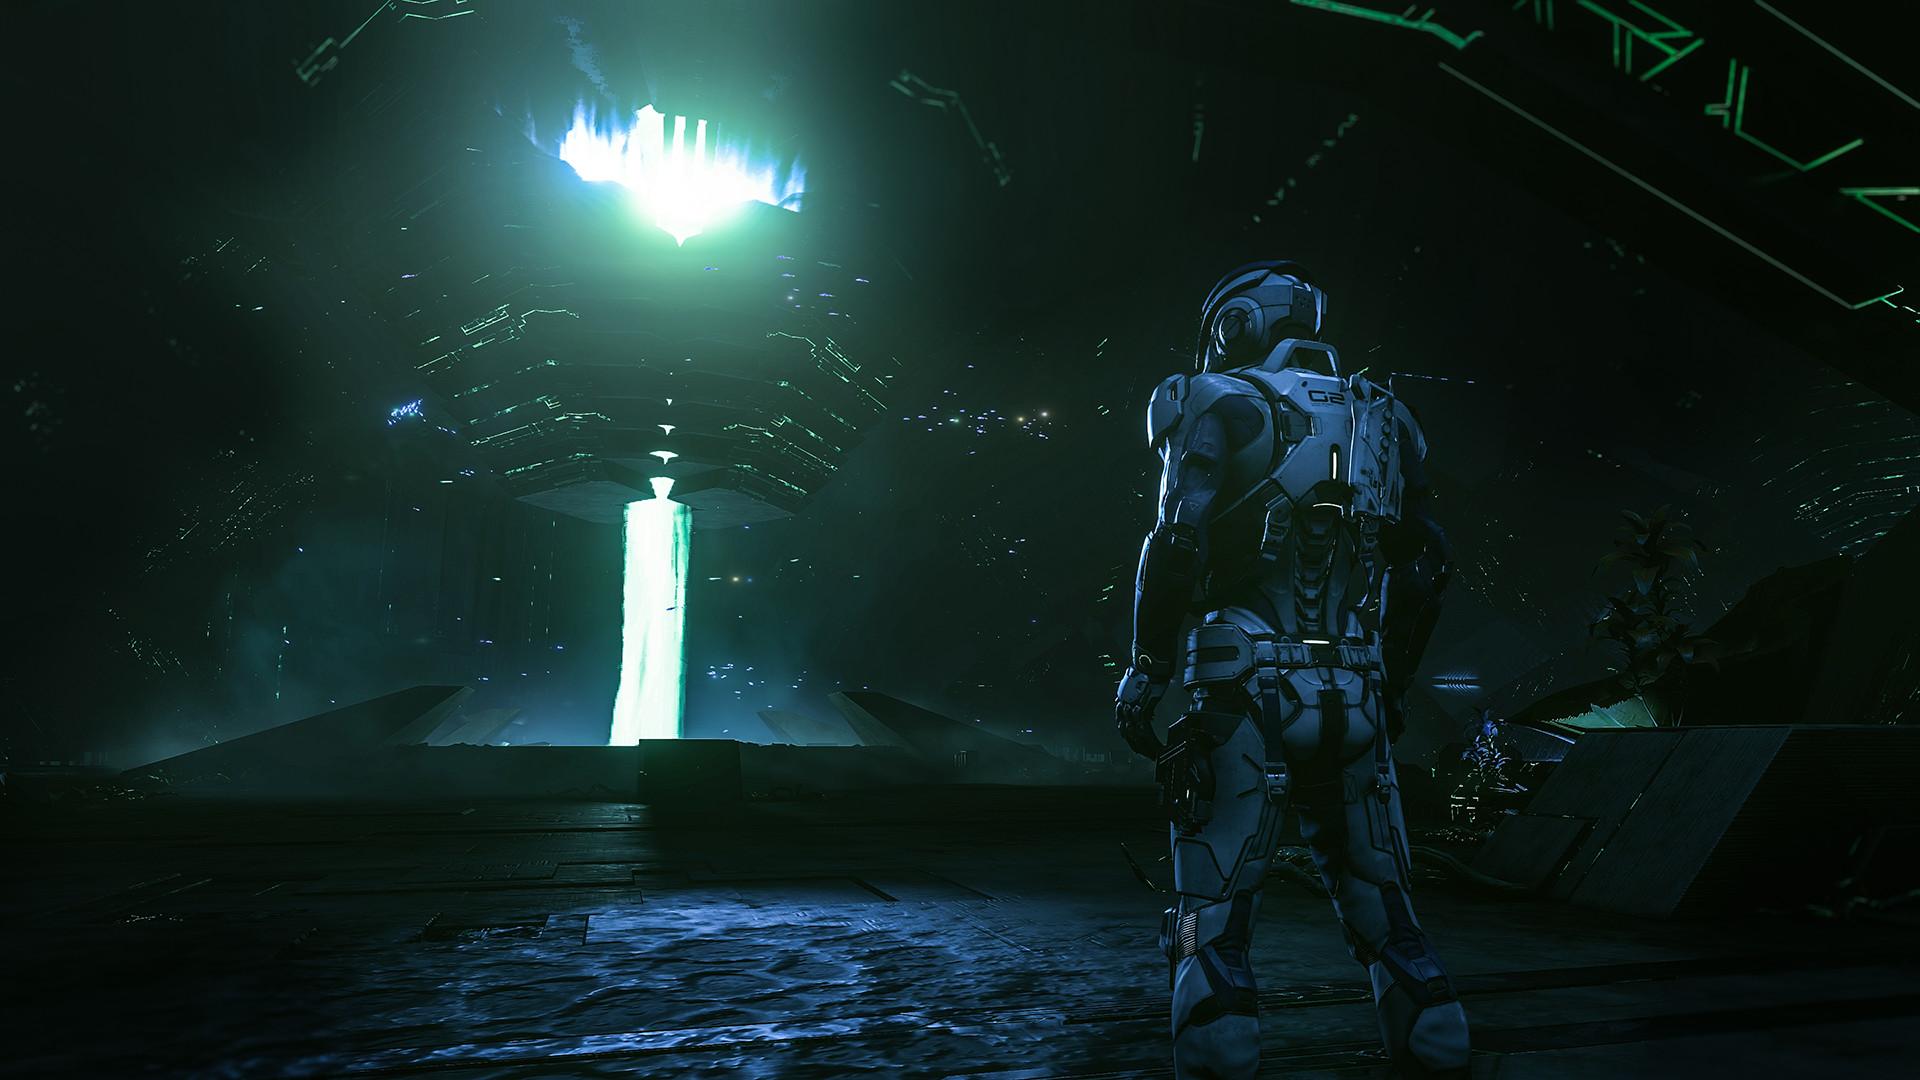 质量效应:仙女座 (Mass Effect:Andromeda)【v1.10豪华版 轩辕简中汉化 补】插图1